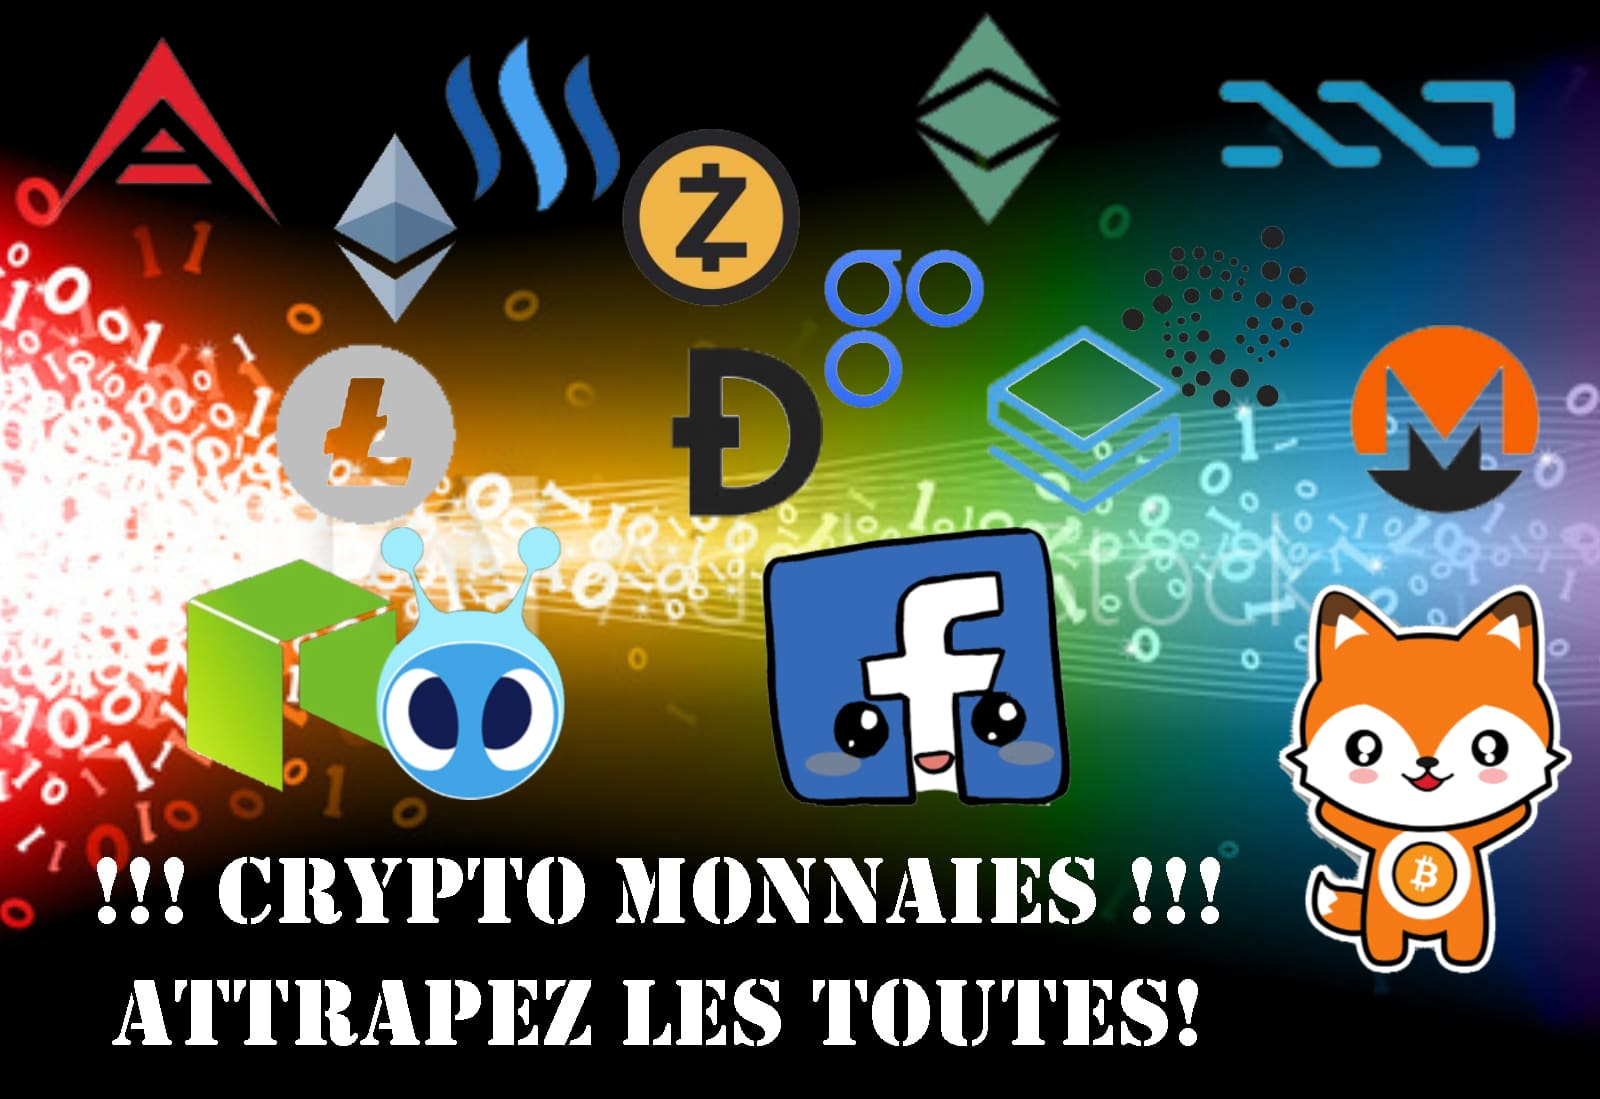 Crypto-monnaies, Bitcoin, Ether, Crypto-actifs - Droit des nouvelles technologies - Vol Cyber infractions